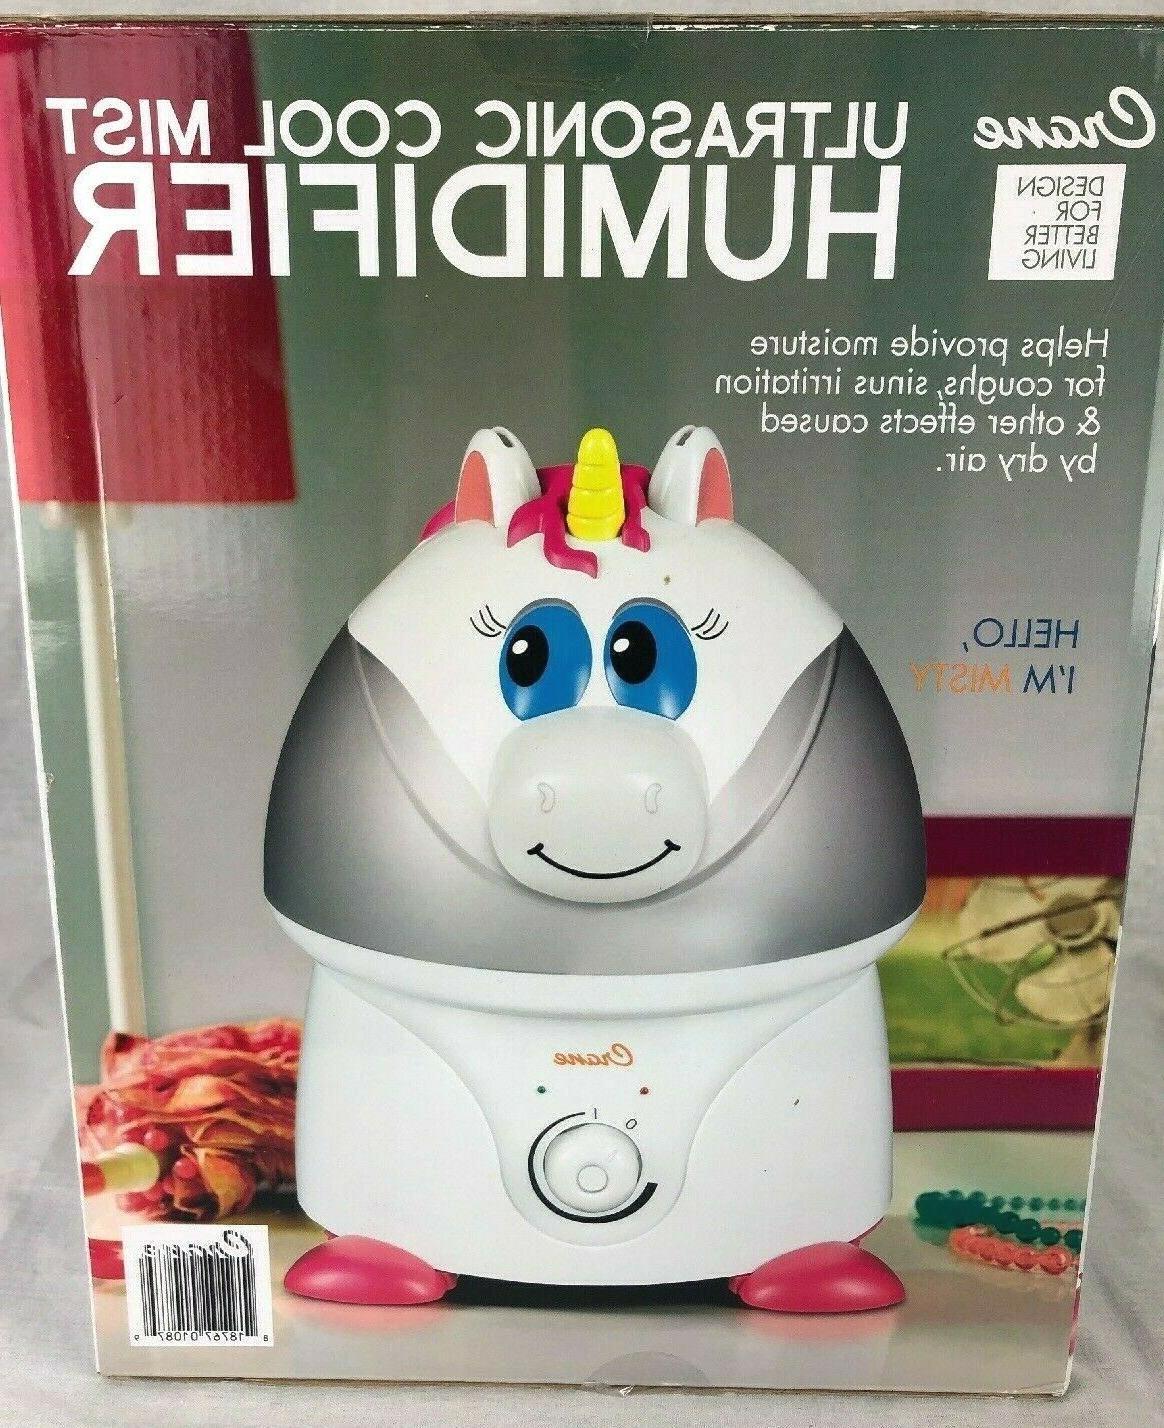 Crane USA Cool Mist Humidifier for Kids, Unicorn